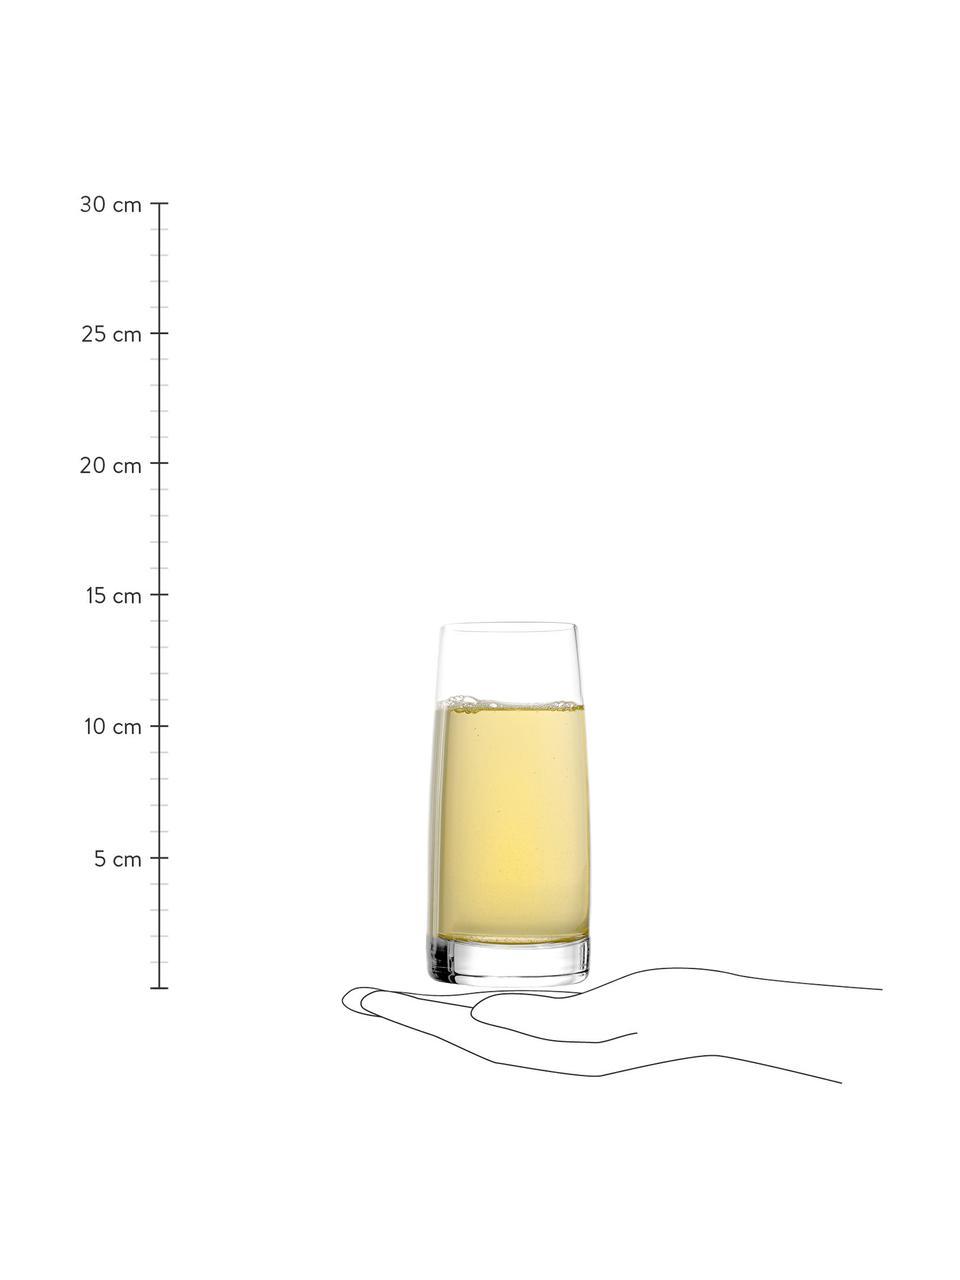 Hohe Kristallgläser Experience, 6 Stück, Kristallglas, Transparent, Ø 7 x H 14 cm